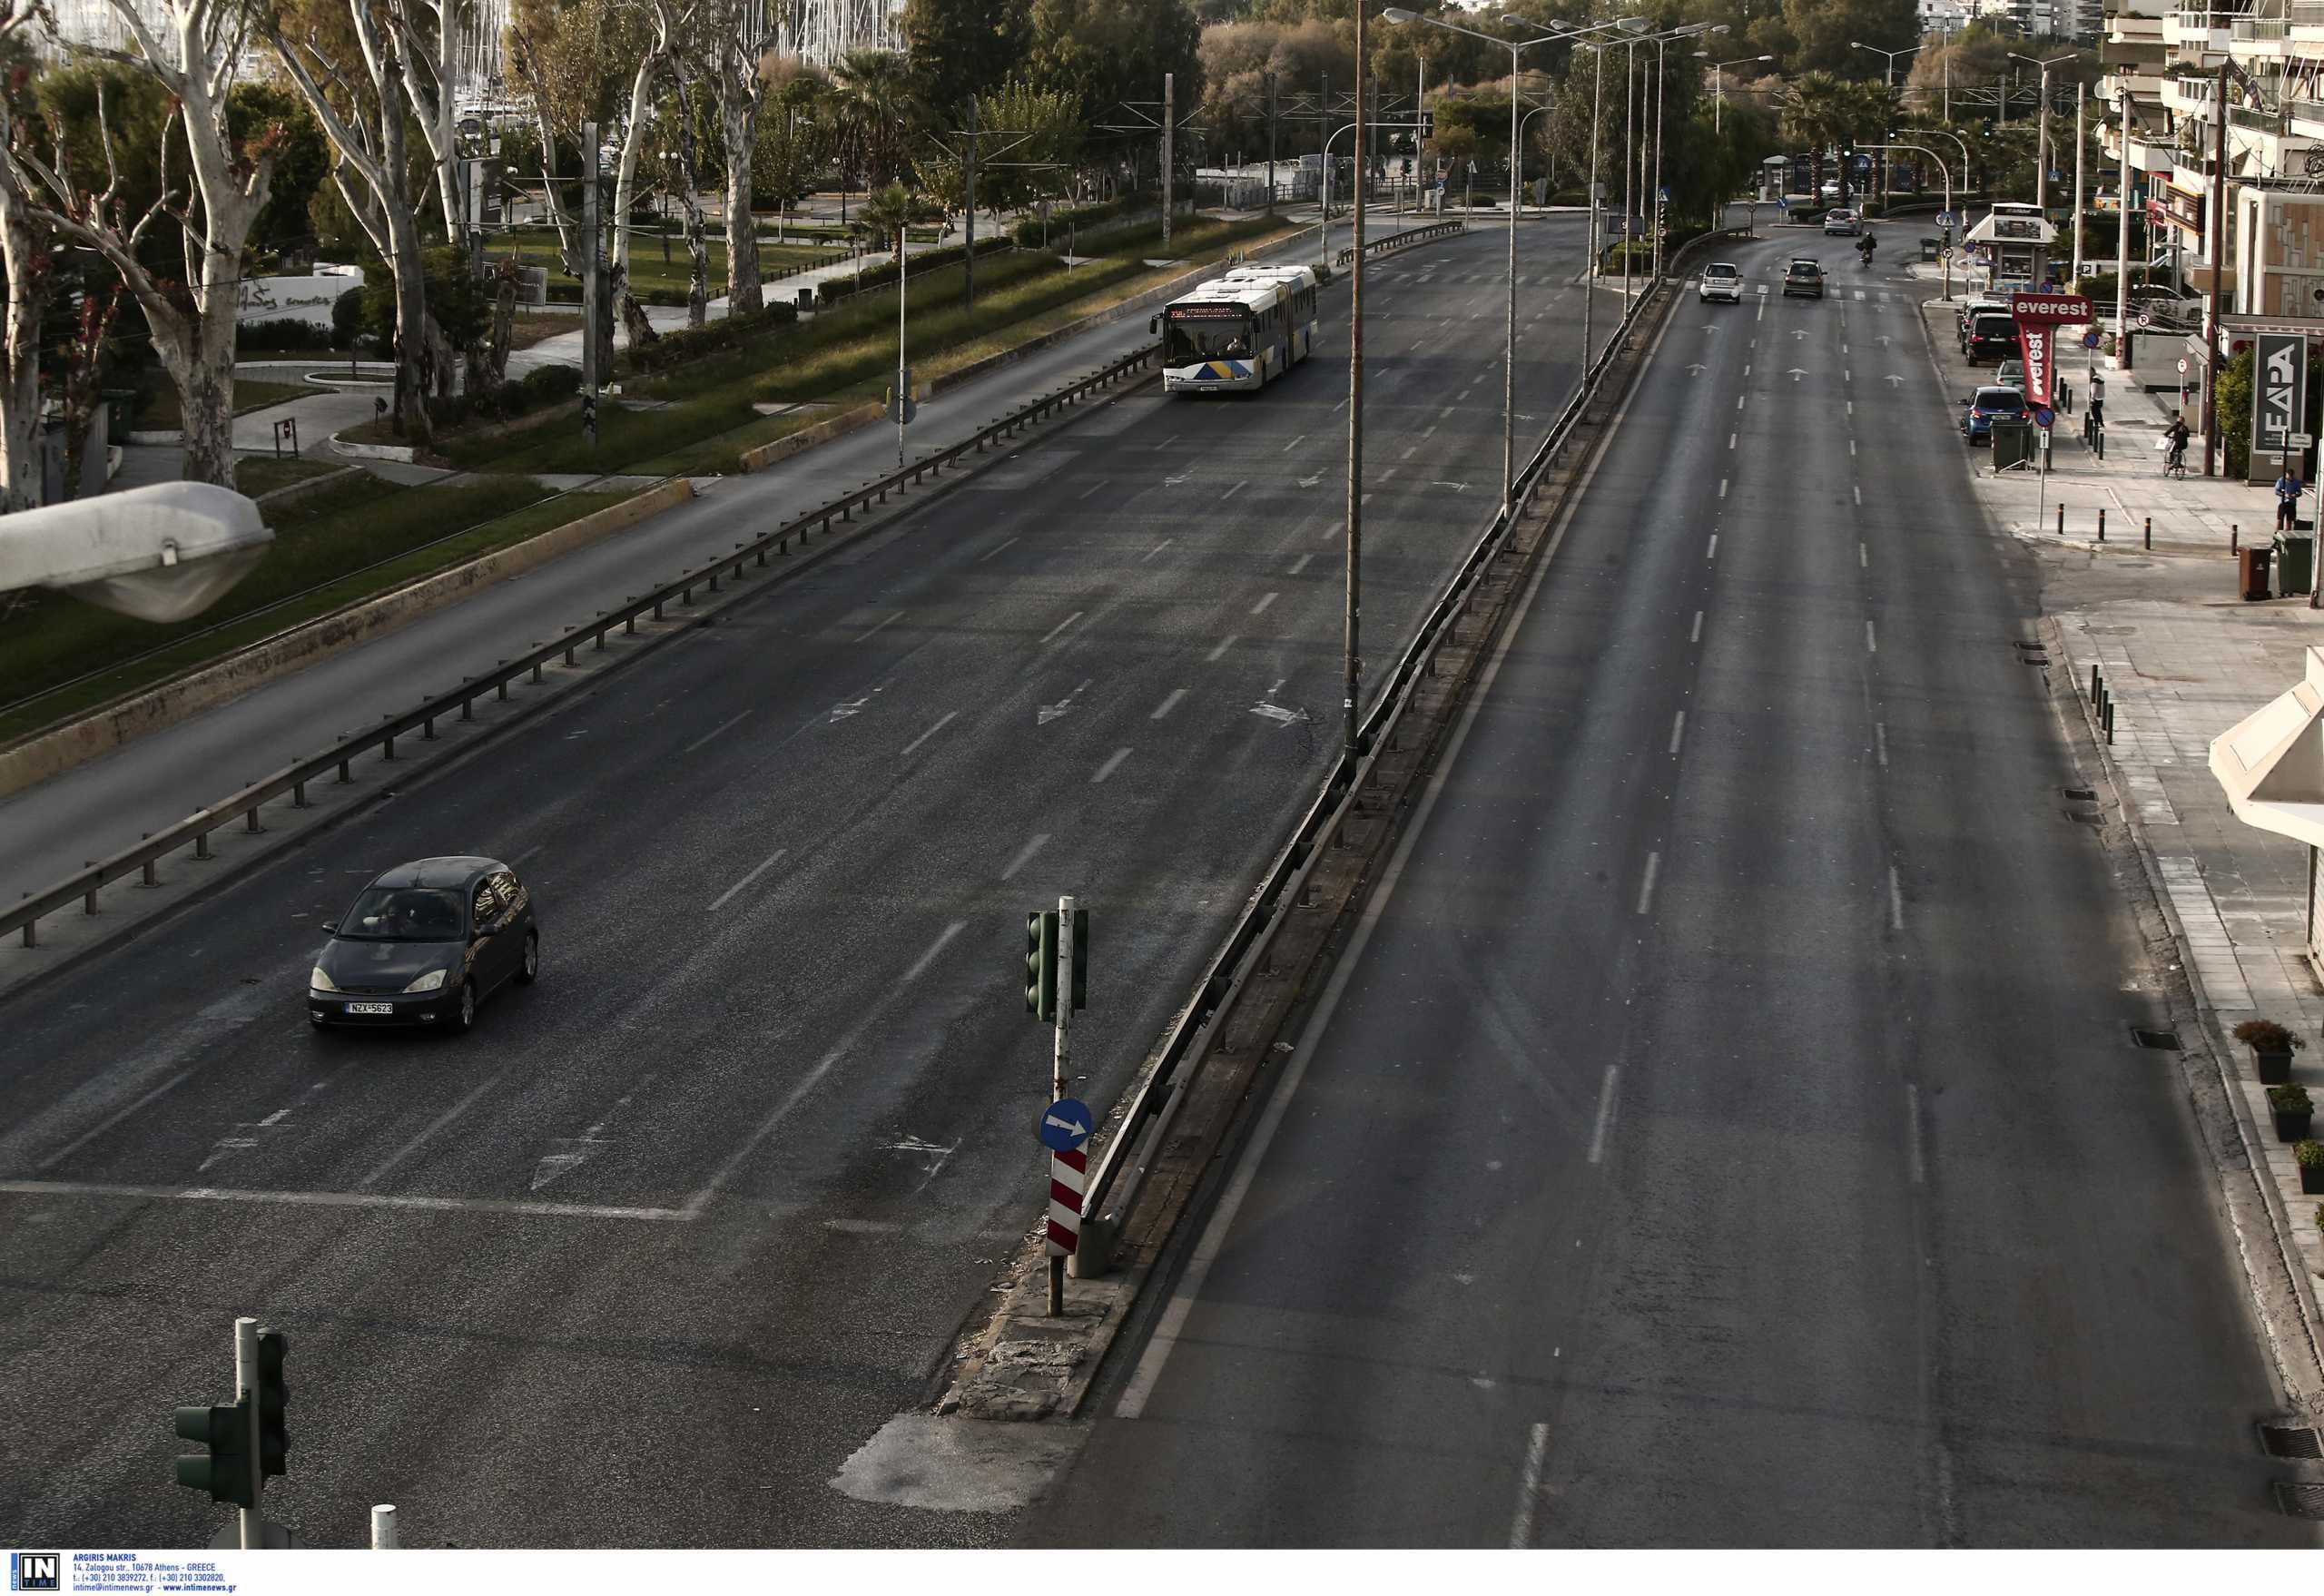 Lockdown: Μαραθώνια συνεδρίαση των ειδικών – «Μάχη» για τα σχολεία και ρολά σε Πάτρα, Χαλκίδα και Άγιο Νικόλαο